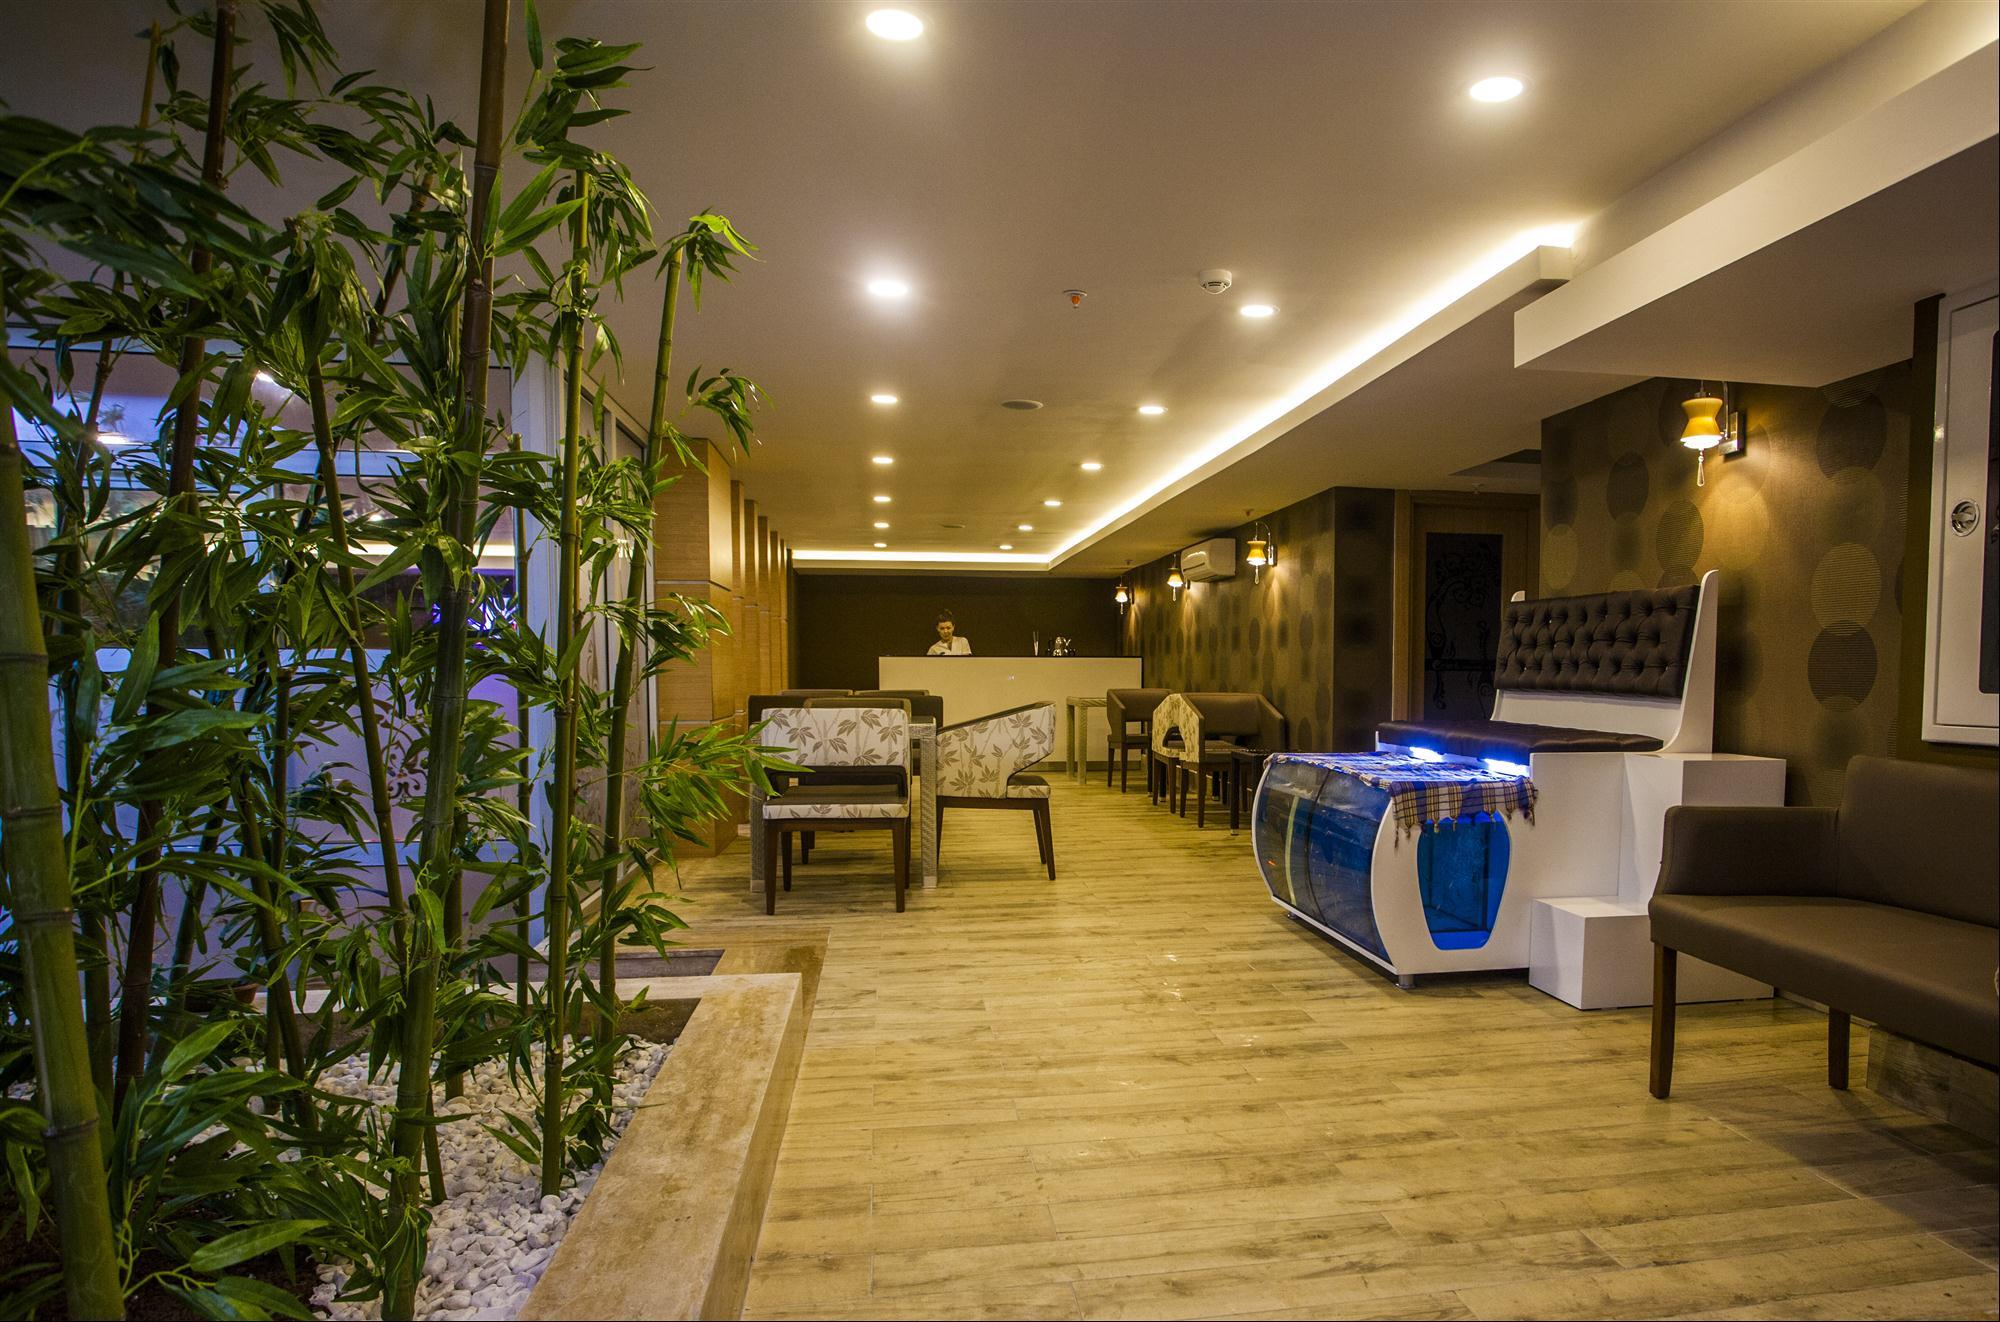 avena-resort-spa-hotel-ex-gold-safran-hotel-genel-0015